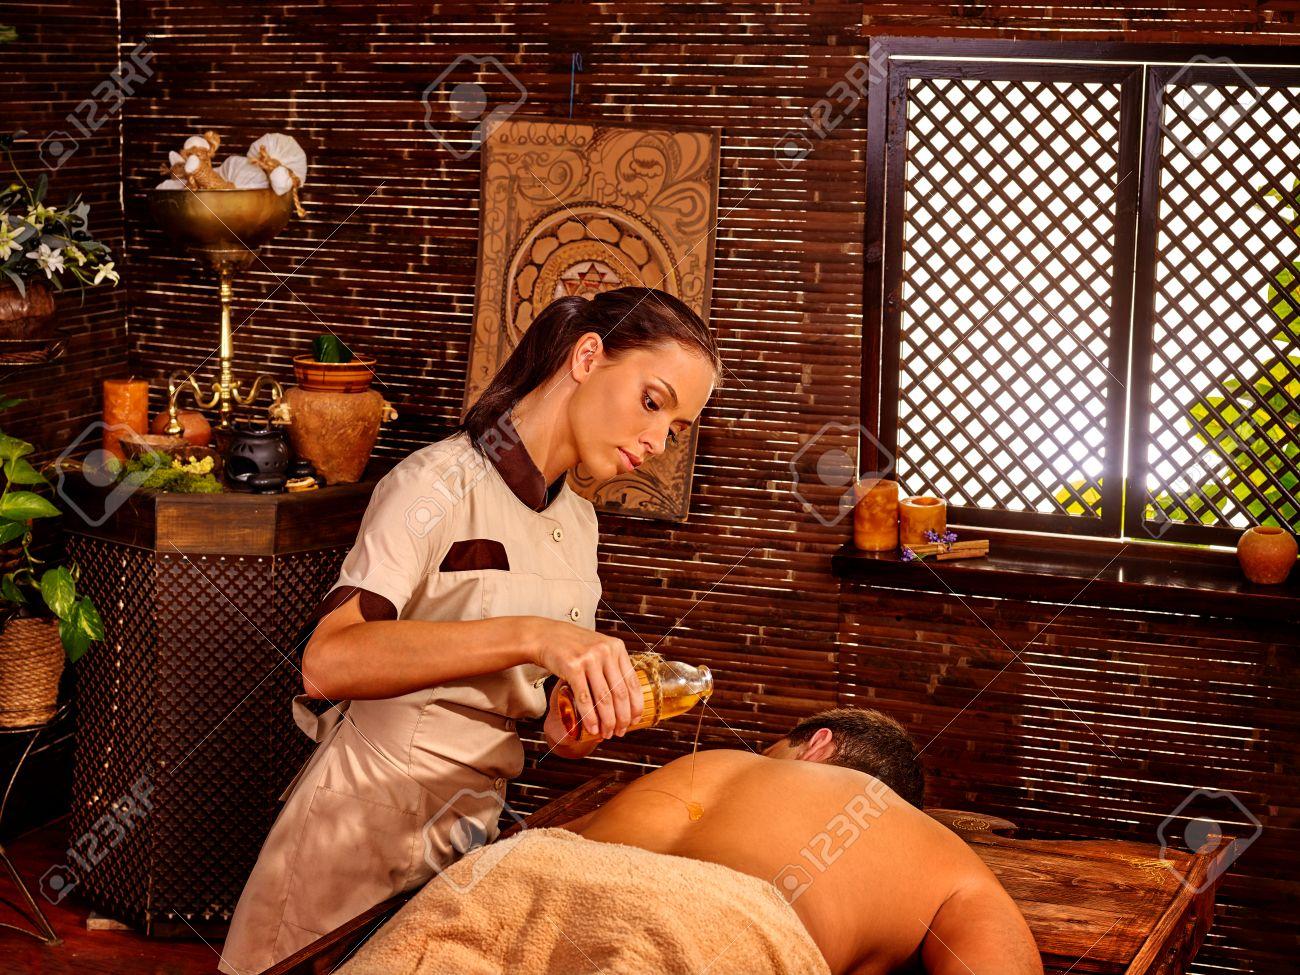 Eroxtic massage